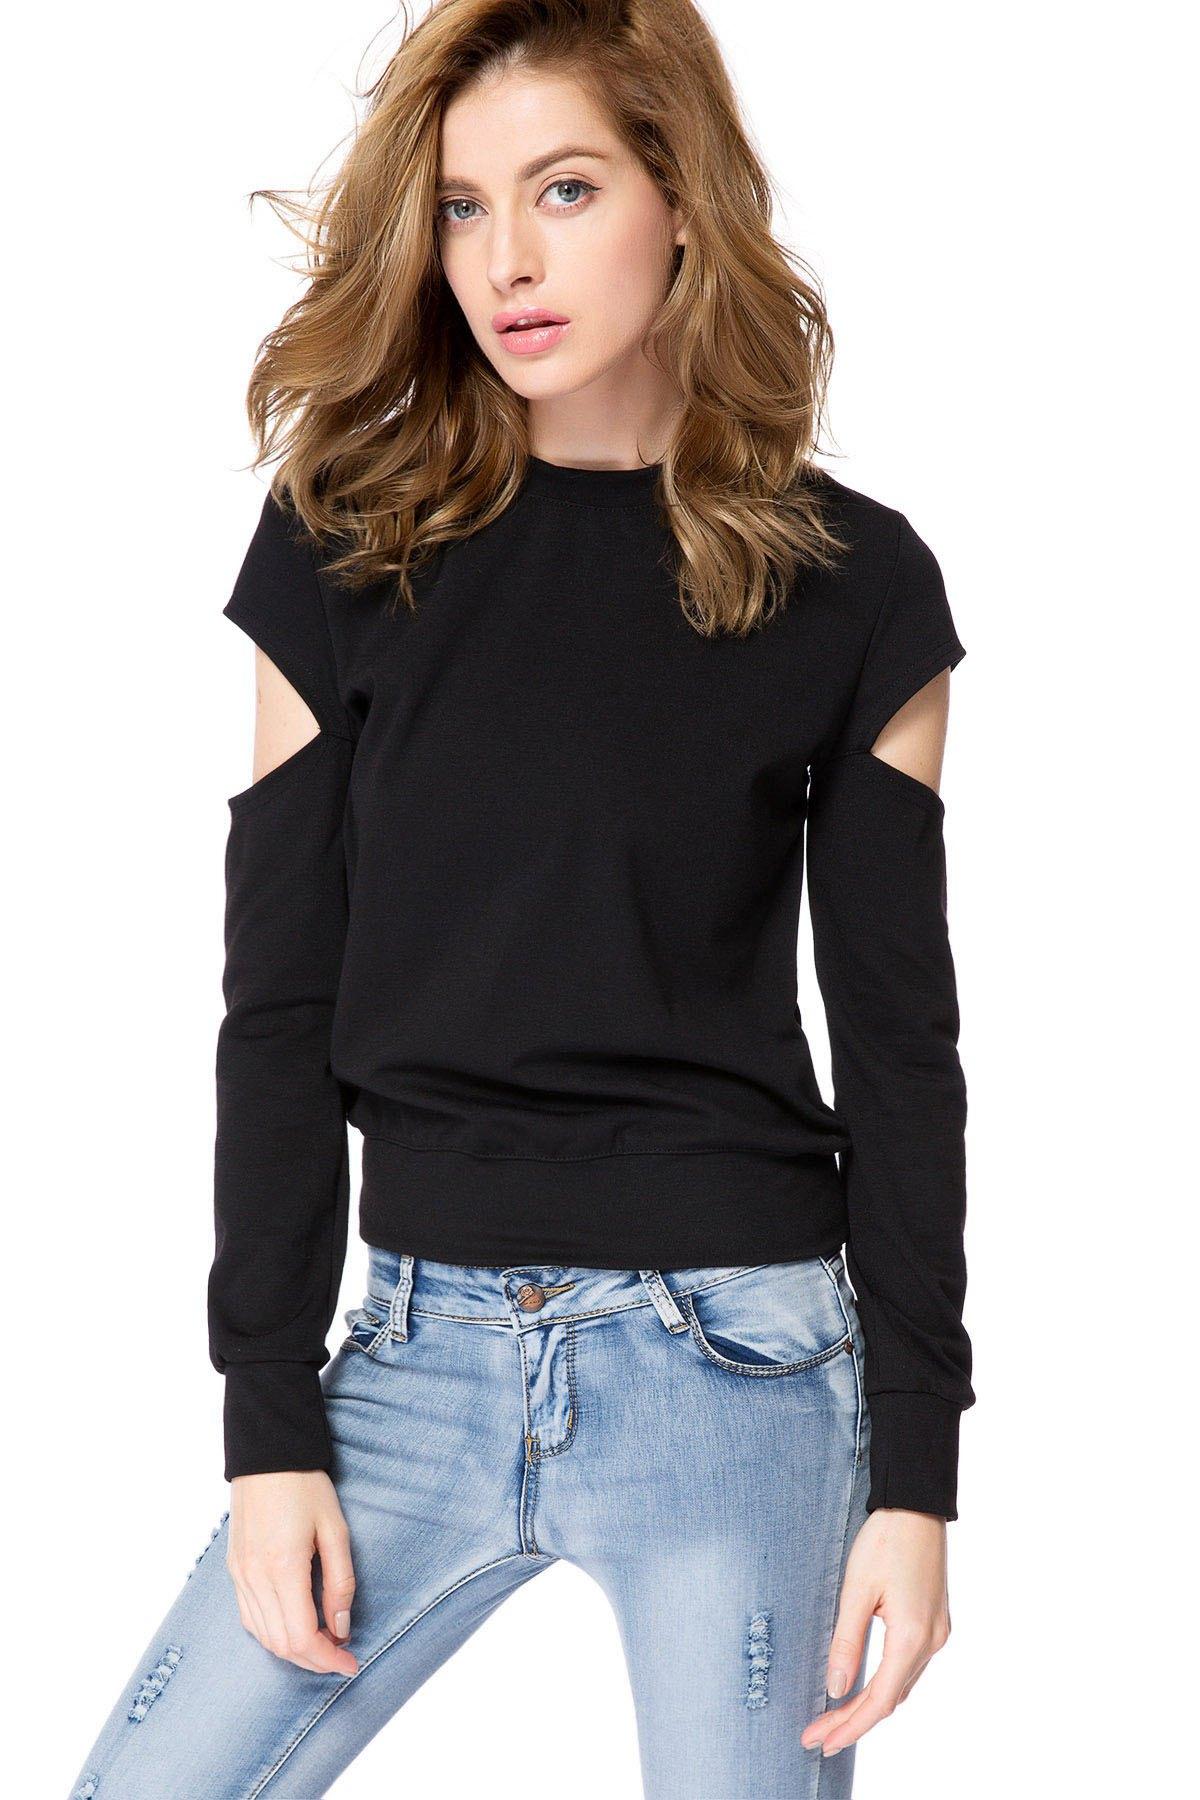 Buy Black Long Sleeve Cut Out Sweatshirt BLACK XL